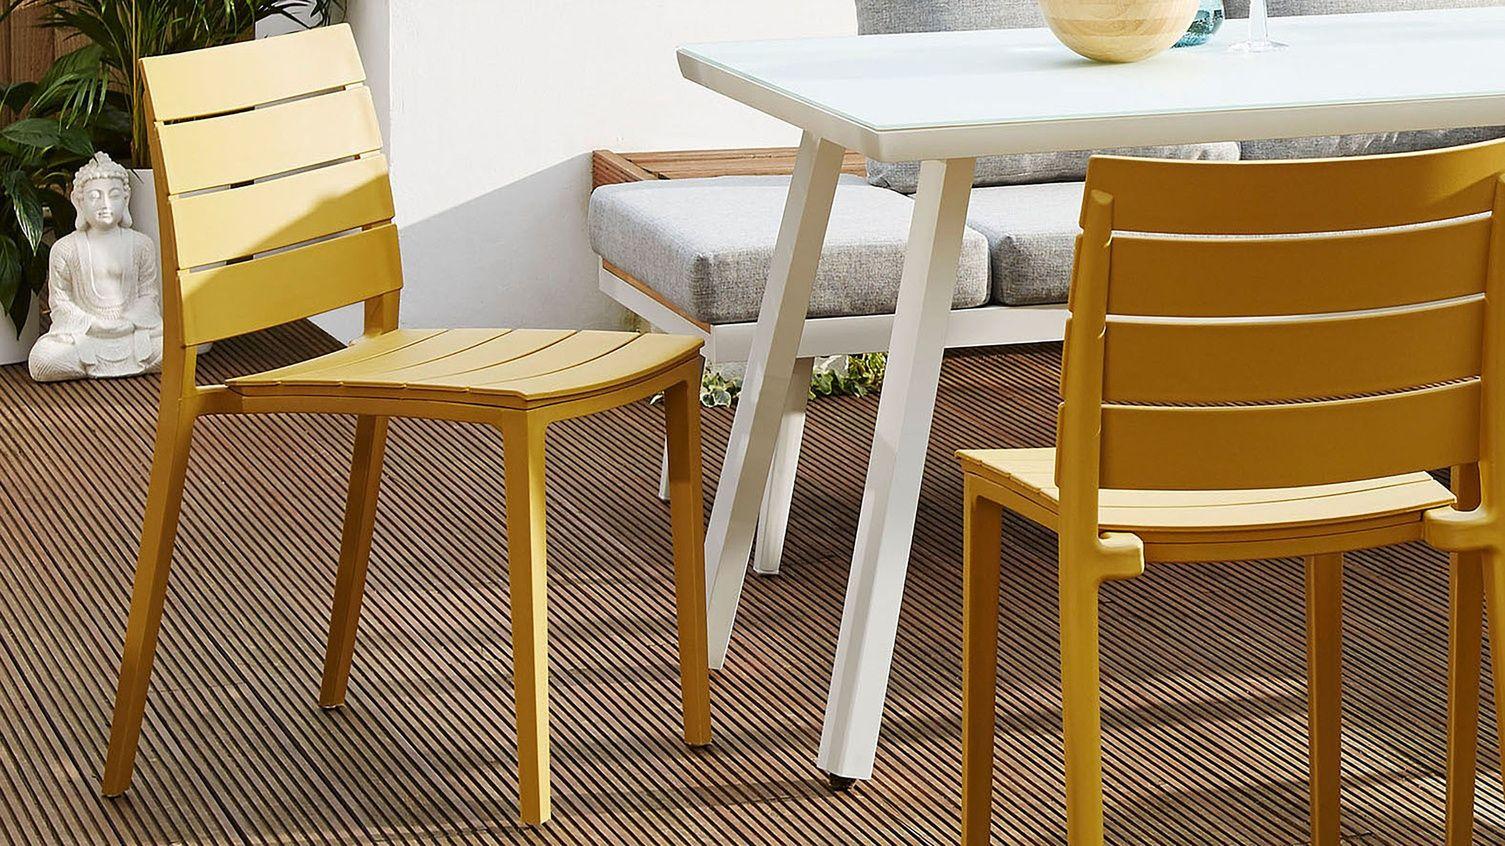 E Garden Chair Danetti Uk